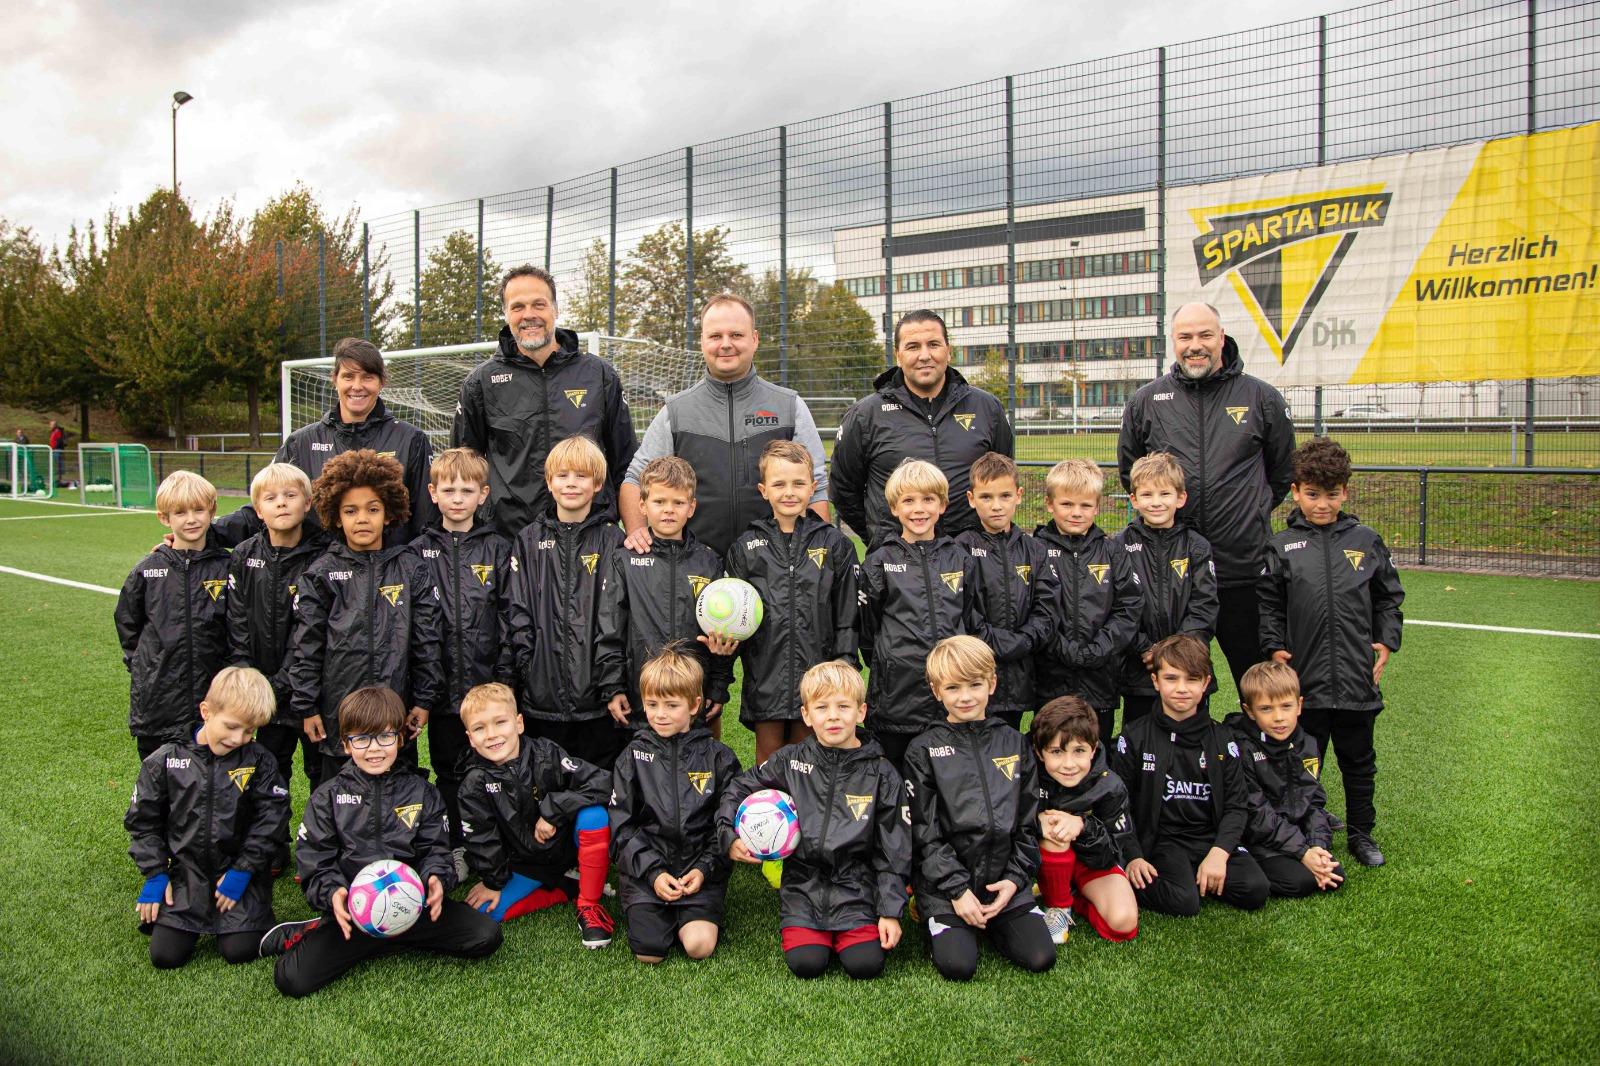 Team Piotr Spart Bilk Sponsor